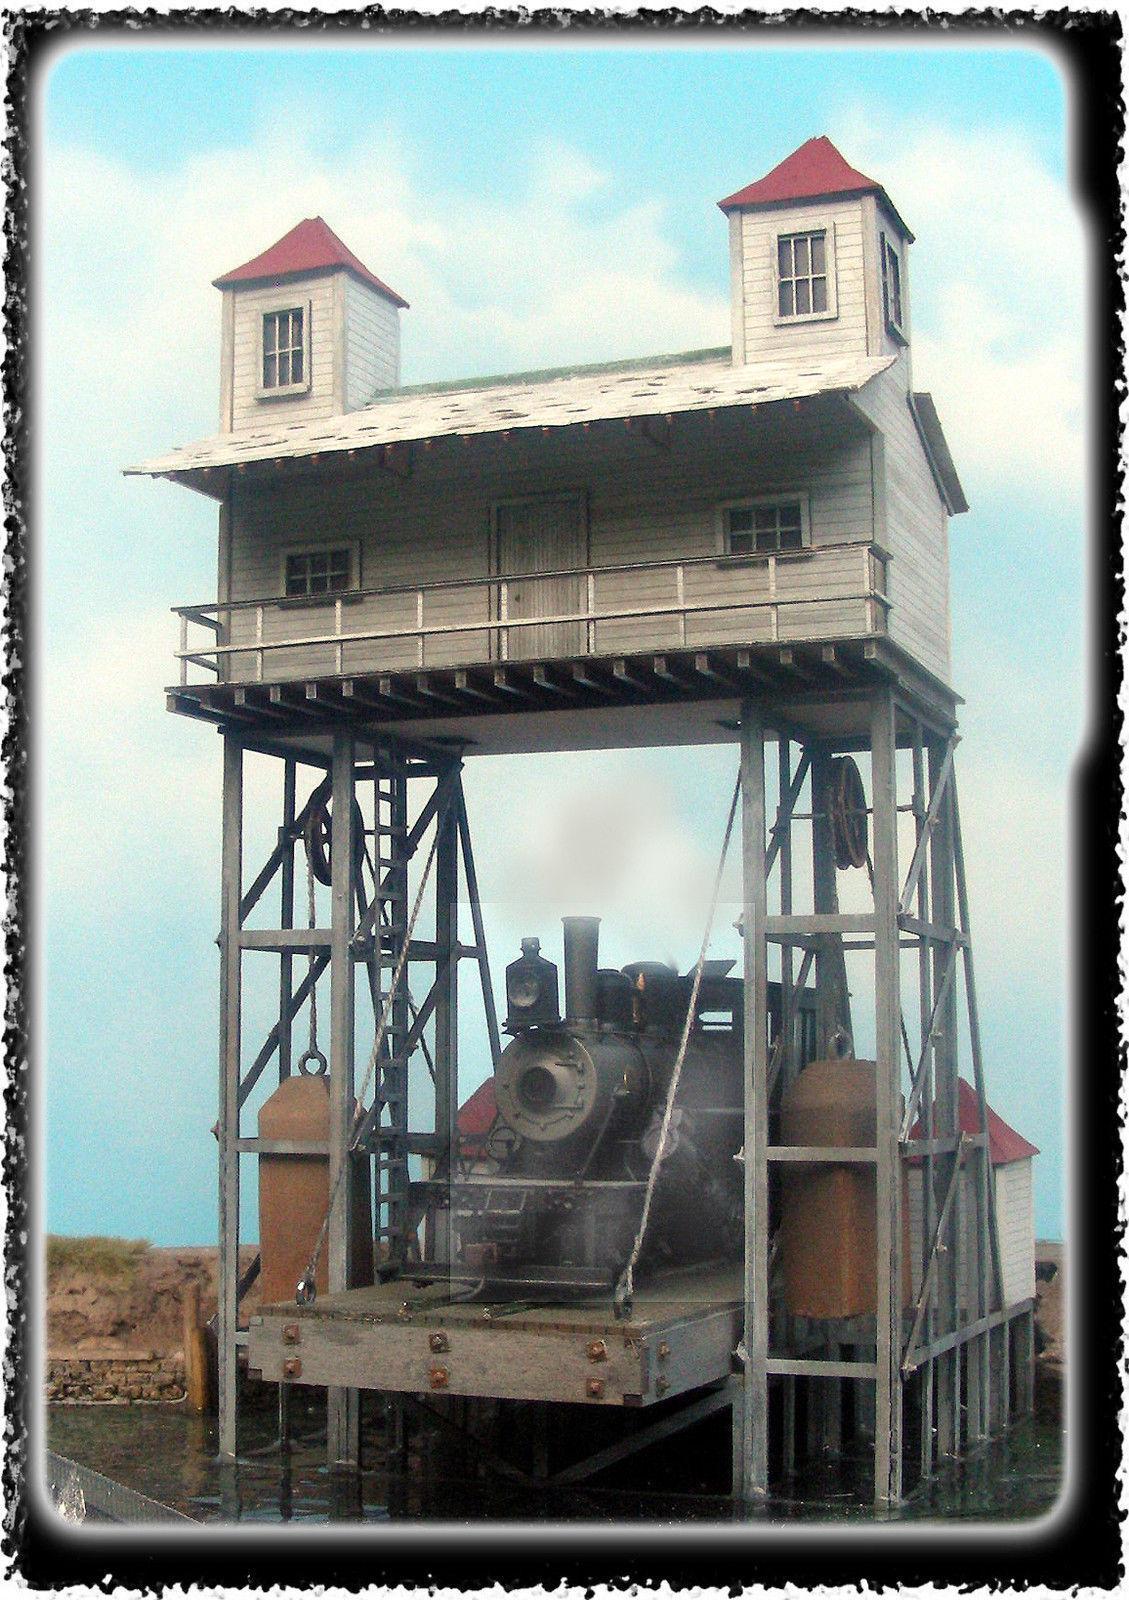 BAR MILLS BUILDINGS 162 HO Raquette Lake Navigation Co Model Railroading Kit